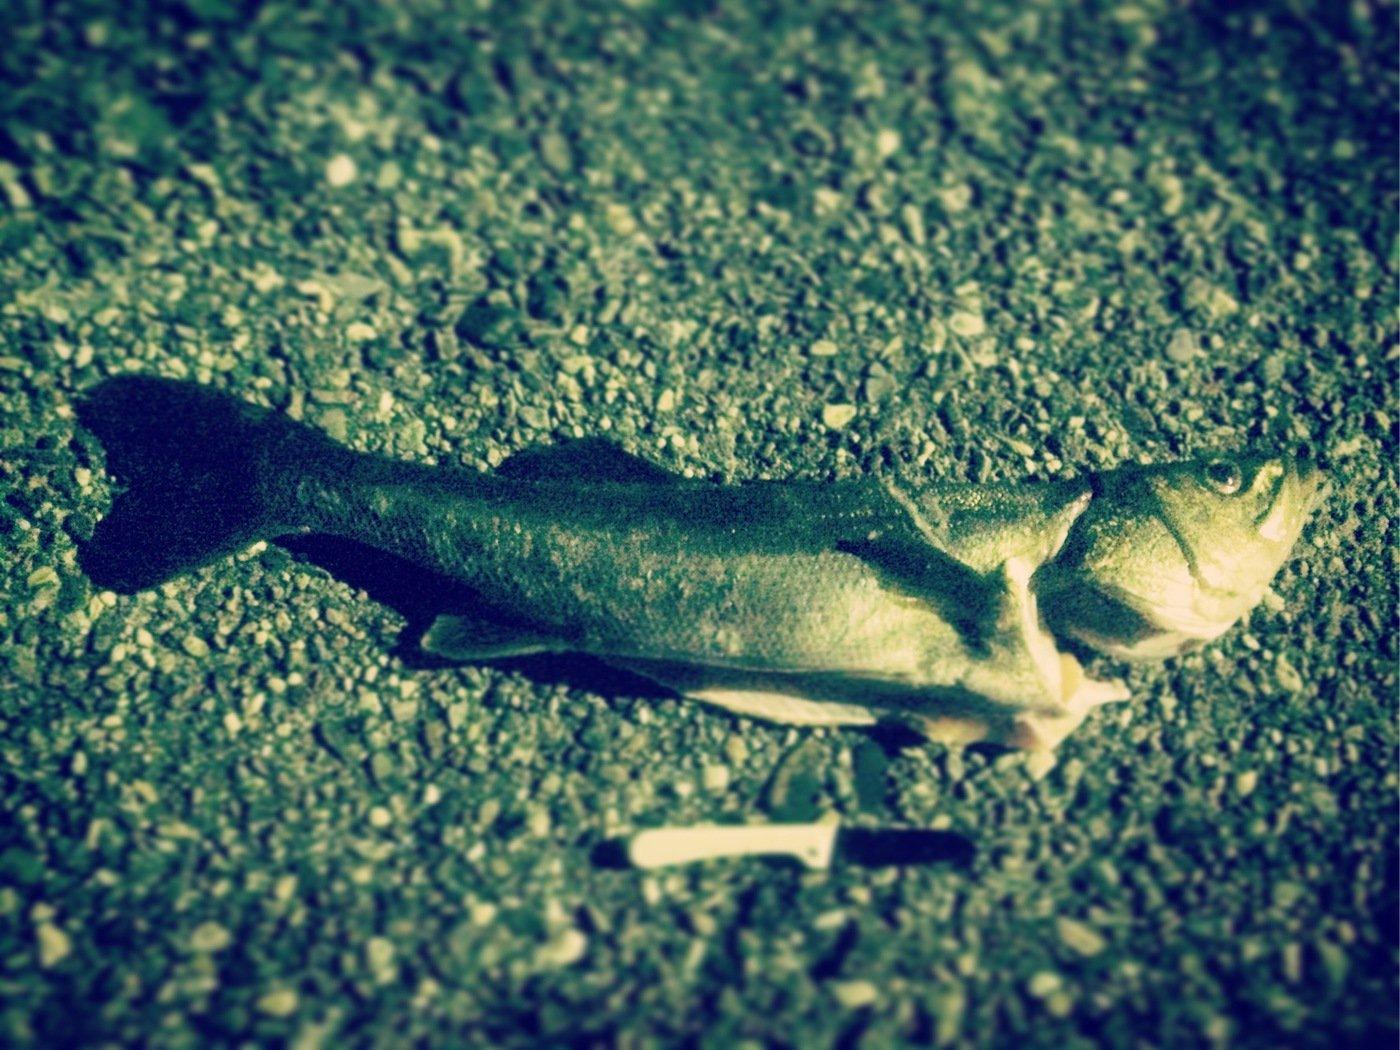 shnbkskさんの投稿画像,写っている魚はスズキ